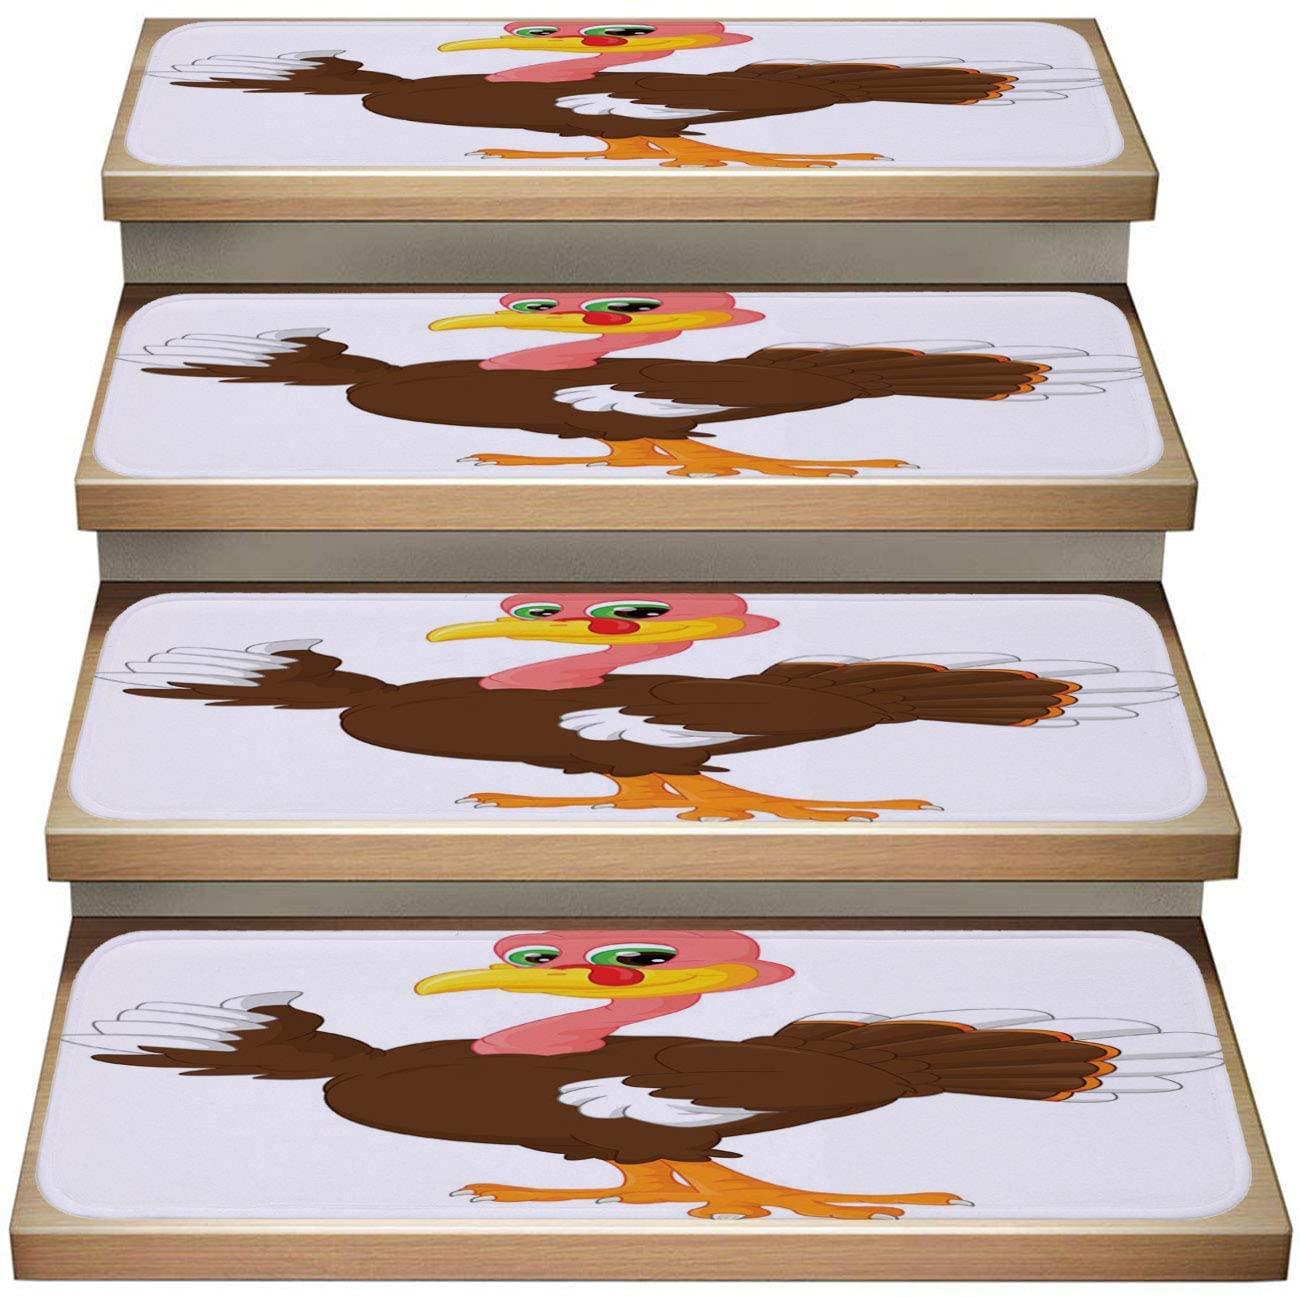 Cartoon 13-Pack Non-Slip Stair Skid Mats,Cartoon Turkey Cartoon,Soft Stair Mat Rotection Kids, Elders, and Dogs Safety